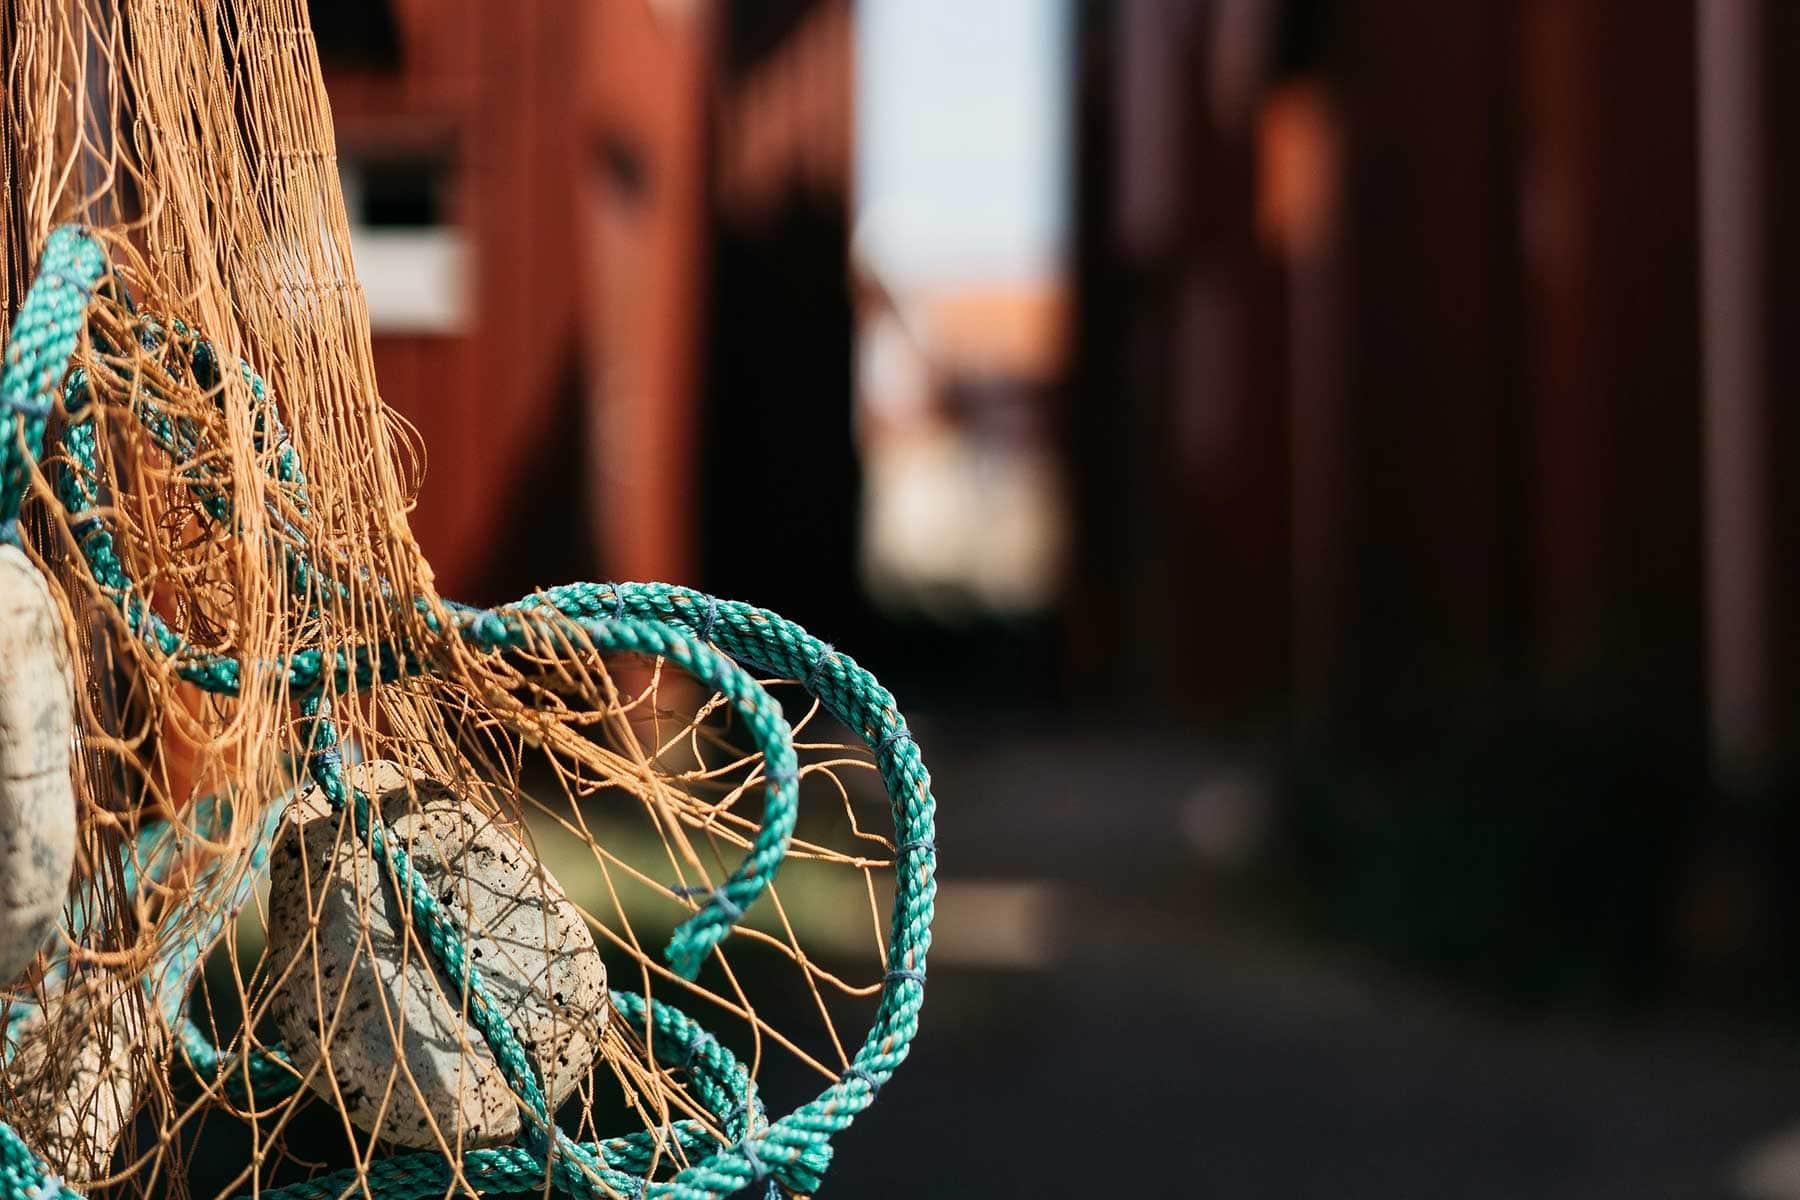 Fiske-på-Västkusten-i-Sverige-med-Nygren-Lind-Resebyrå